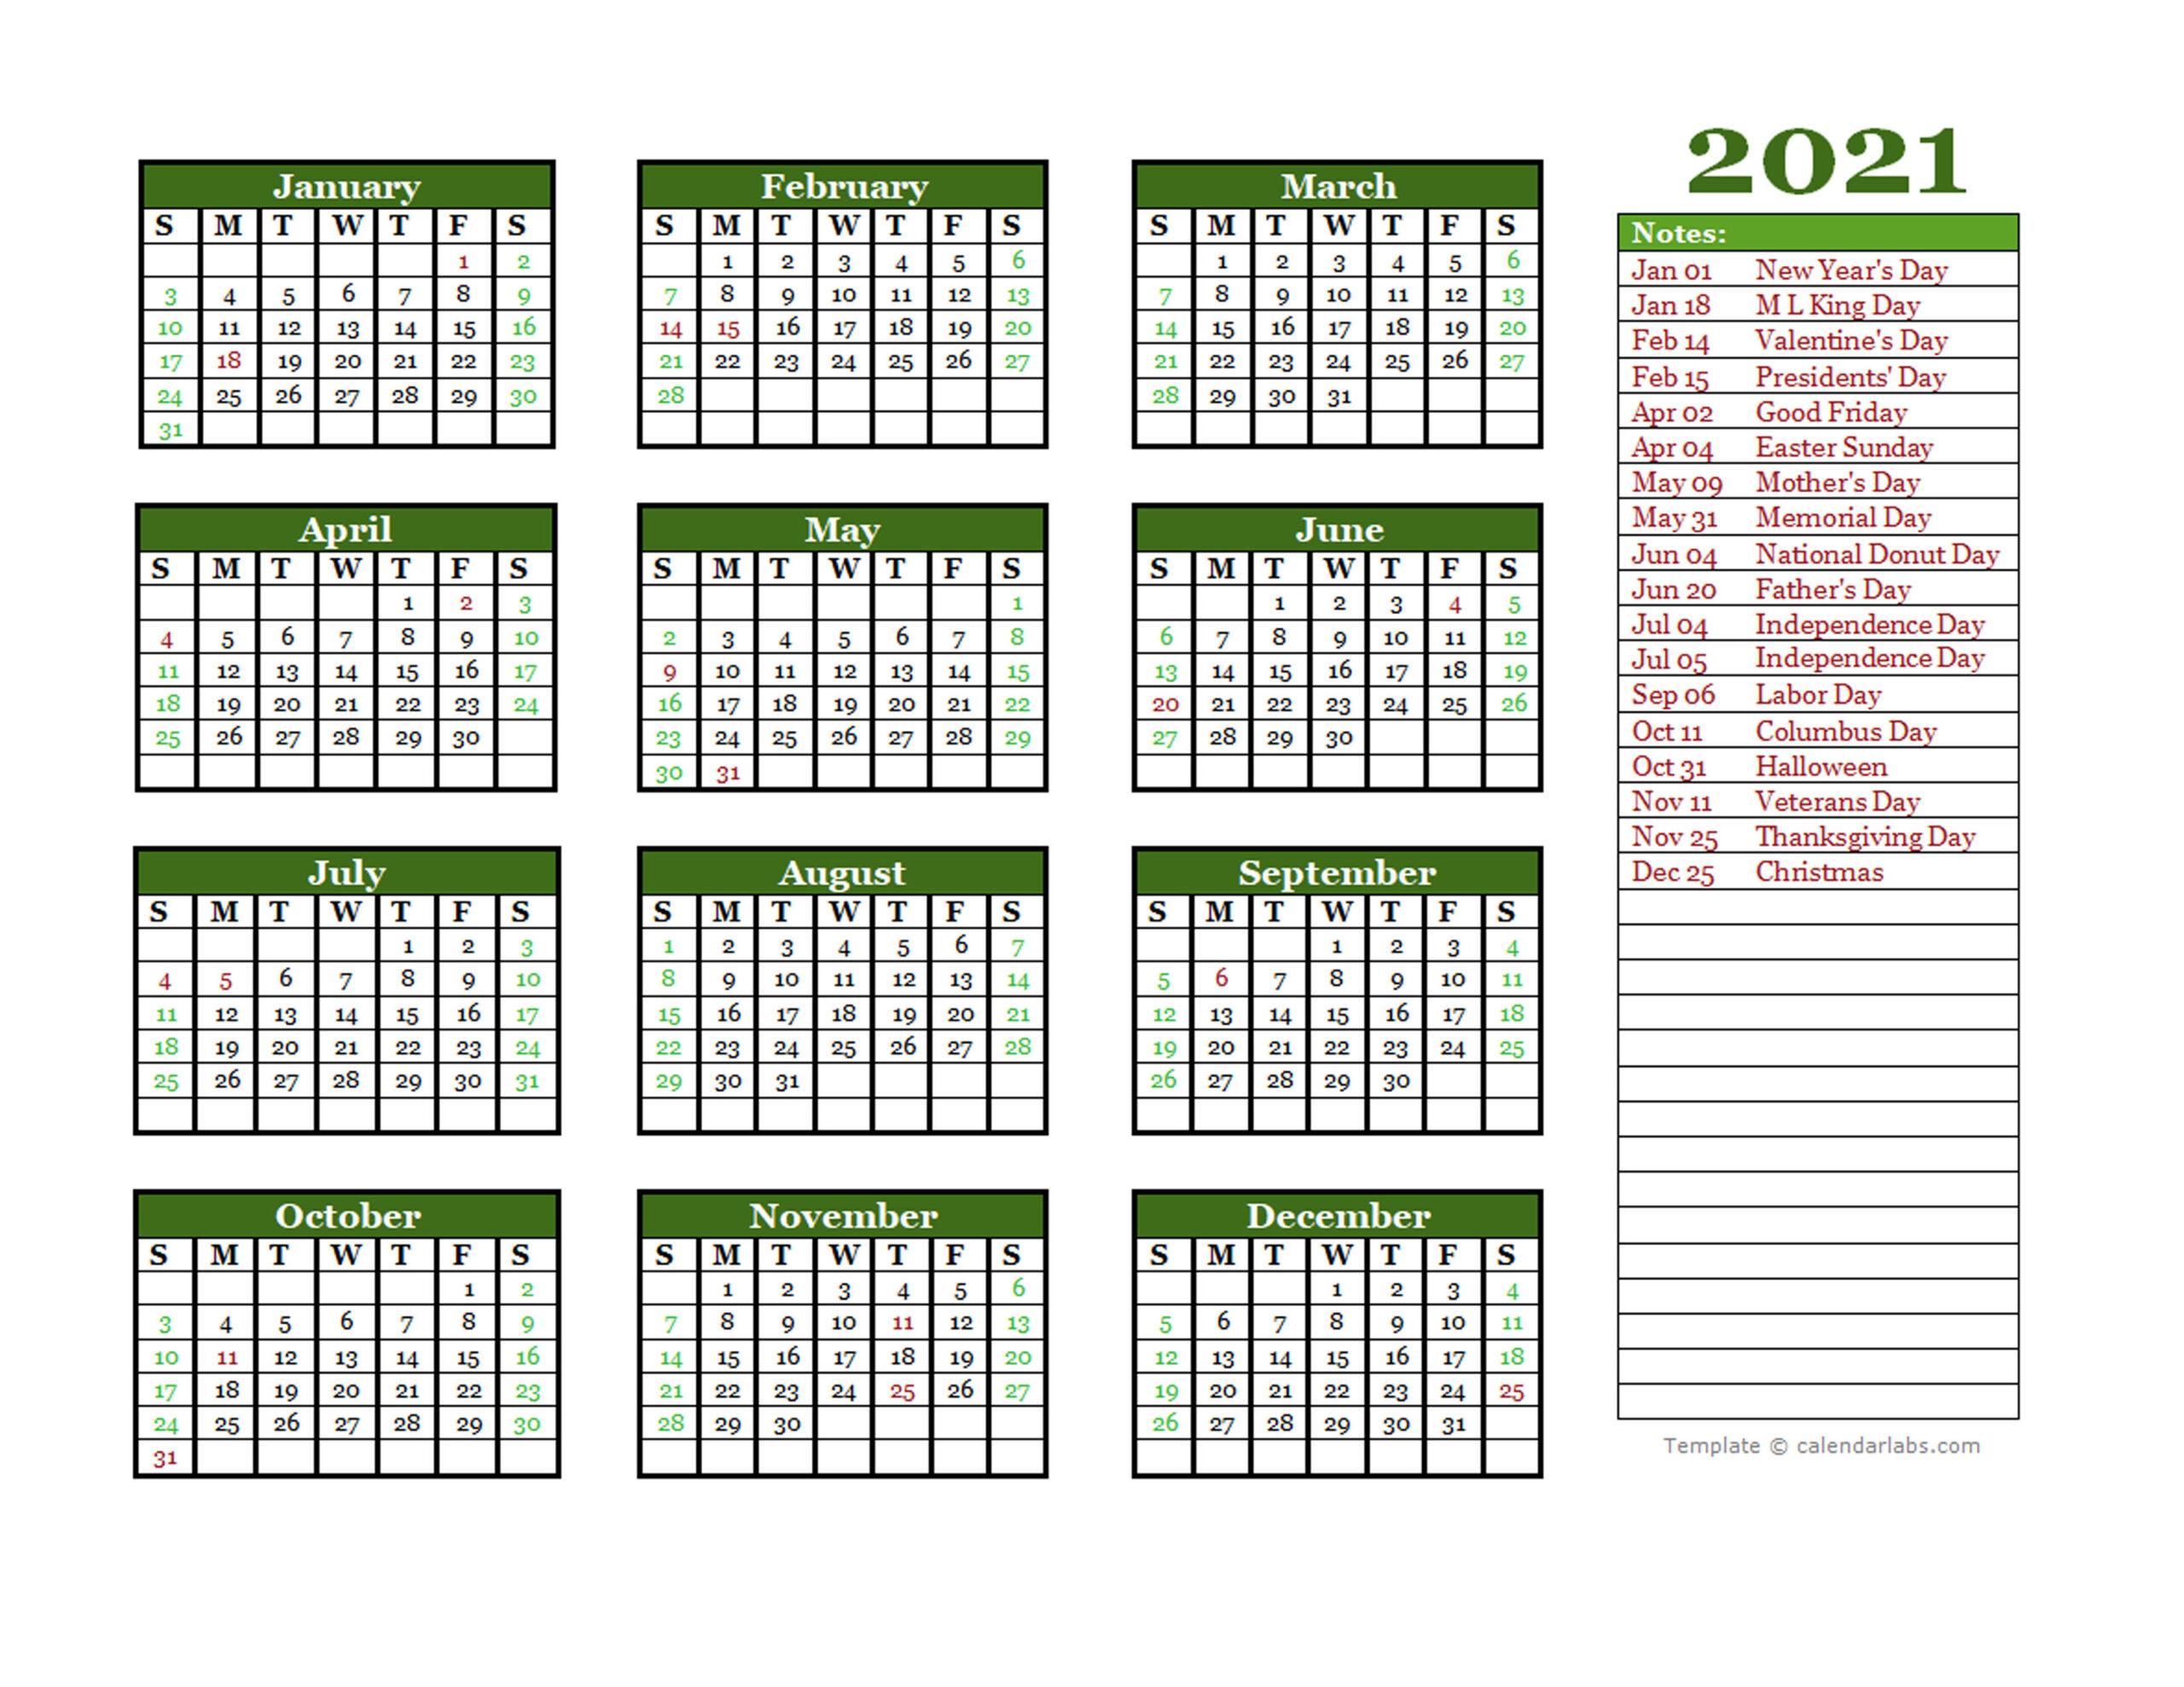 Free Editable 2021 Yearly Word Calendar - Free Printable  Julian Calendar 2021 Excel